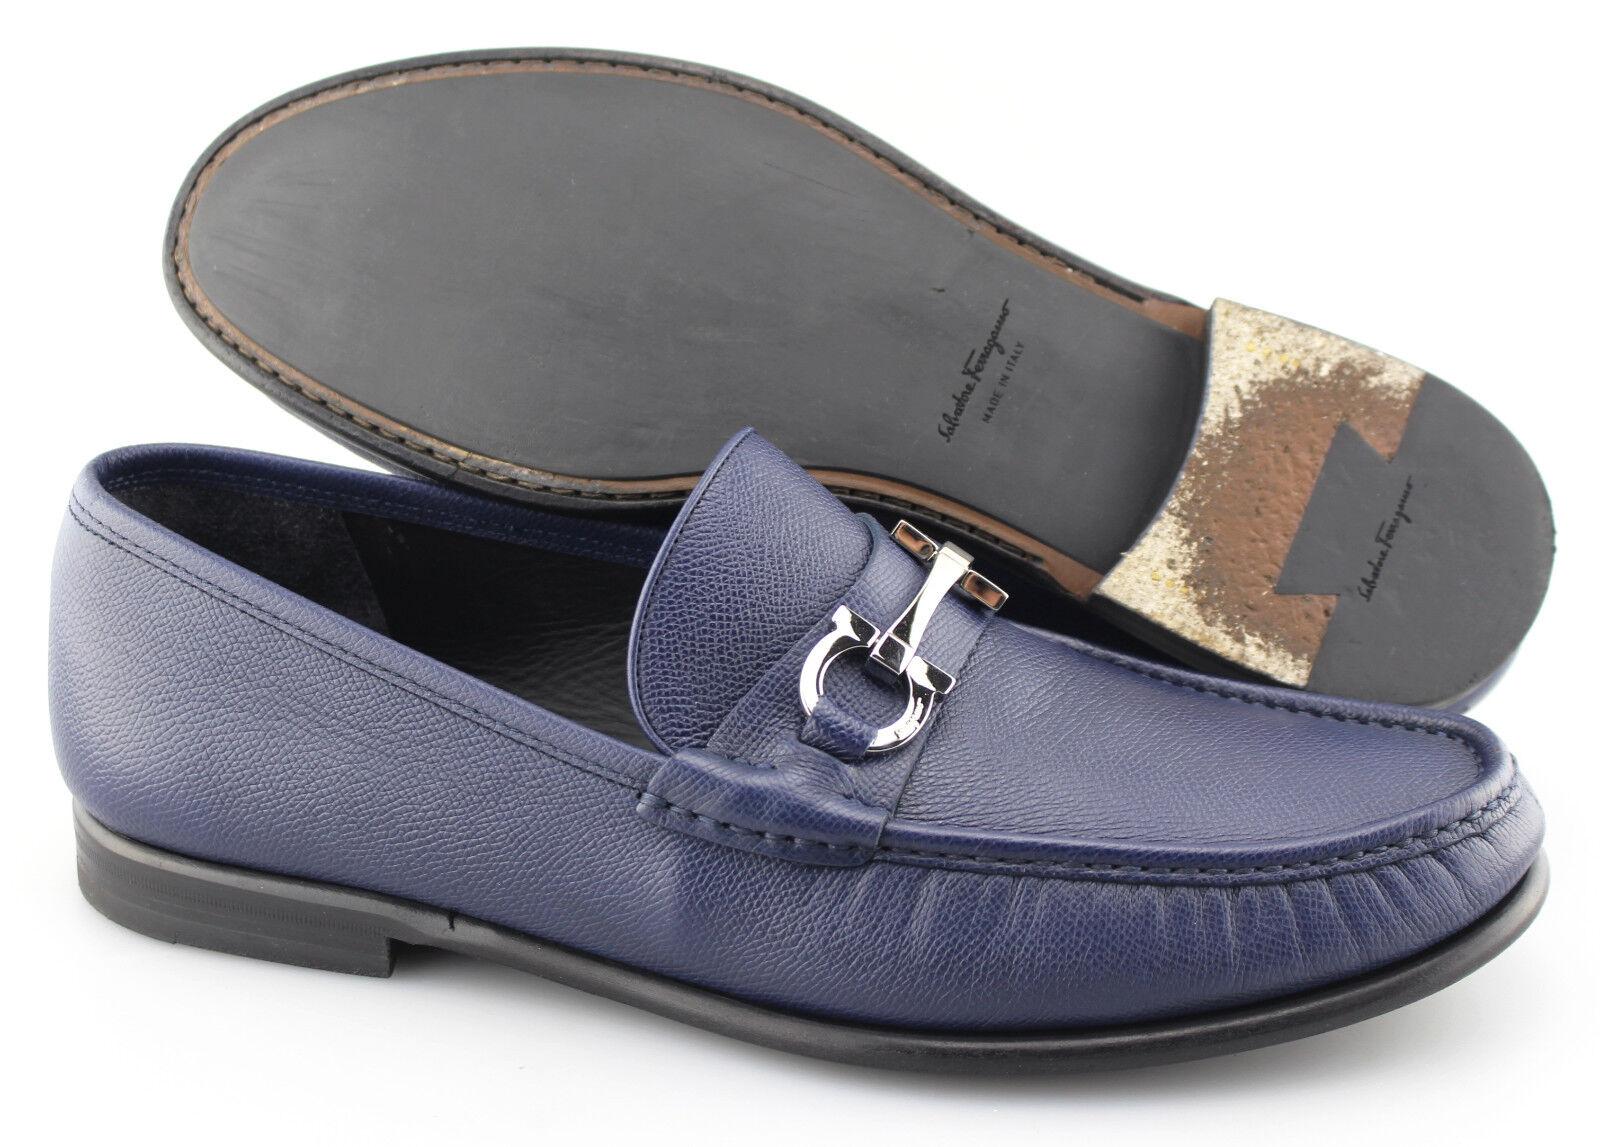 Men's SALVATORE FERRAGAMO 'Crown' Navy bluee Leather Loafers Size US 12 - E